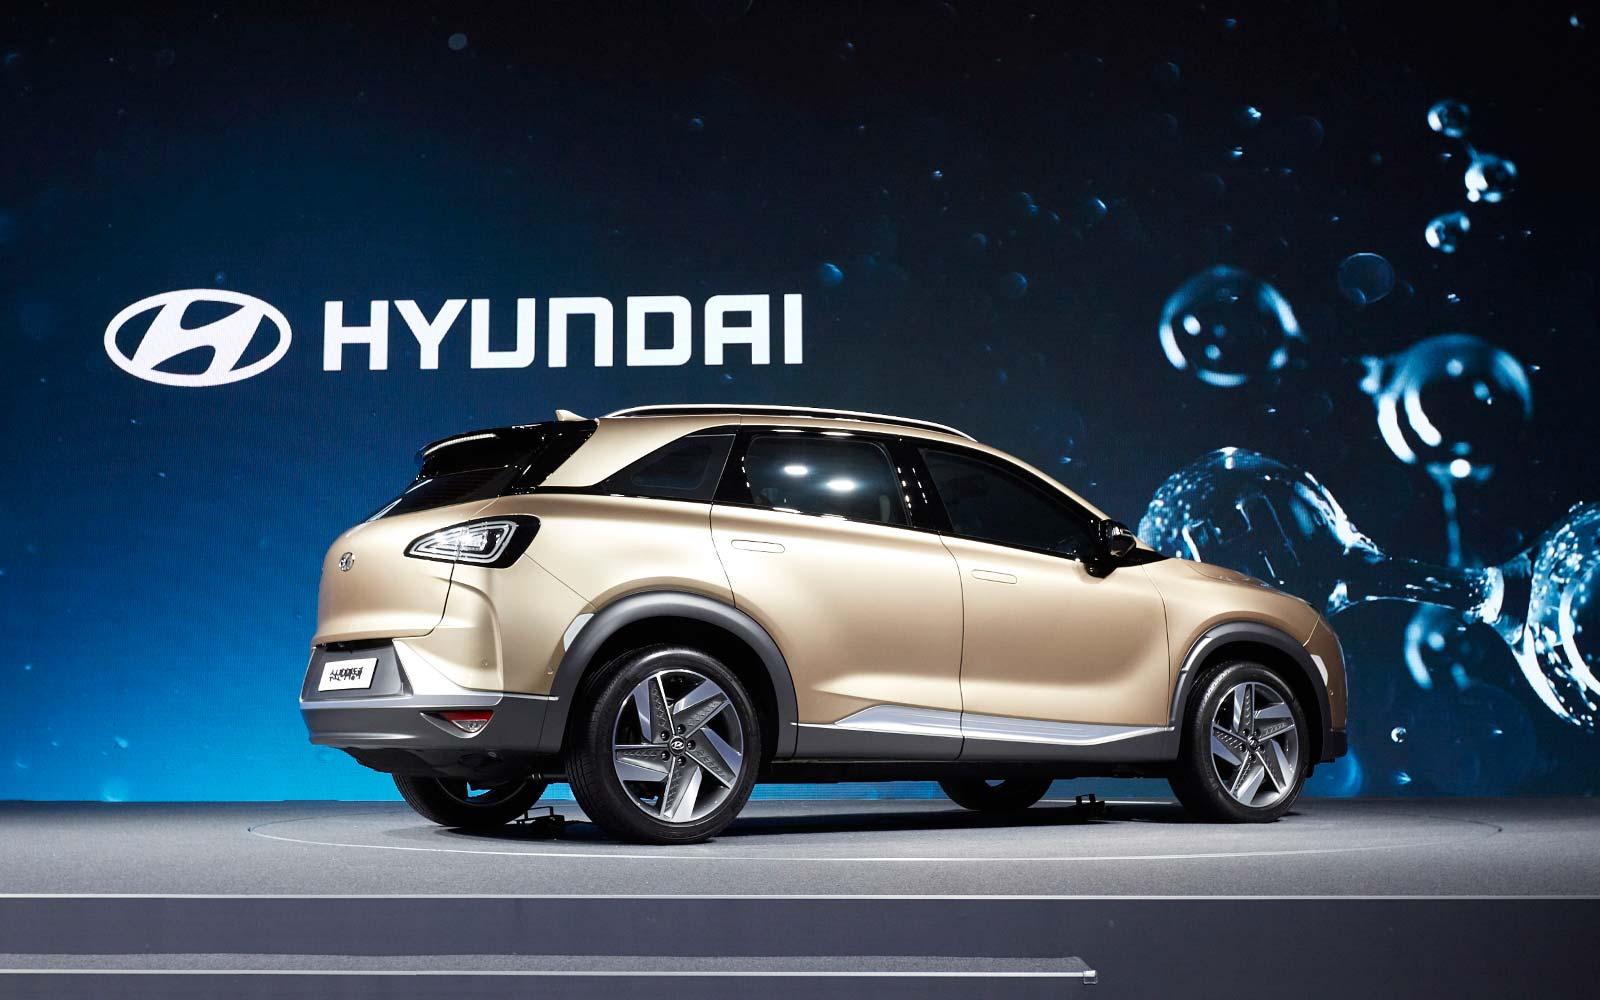 2017-hyundai-next-gen-fuel-cell-suv_4